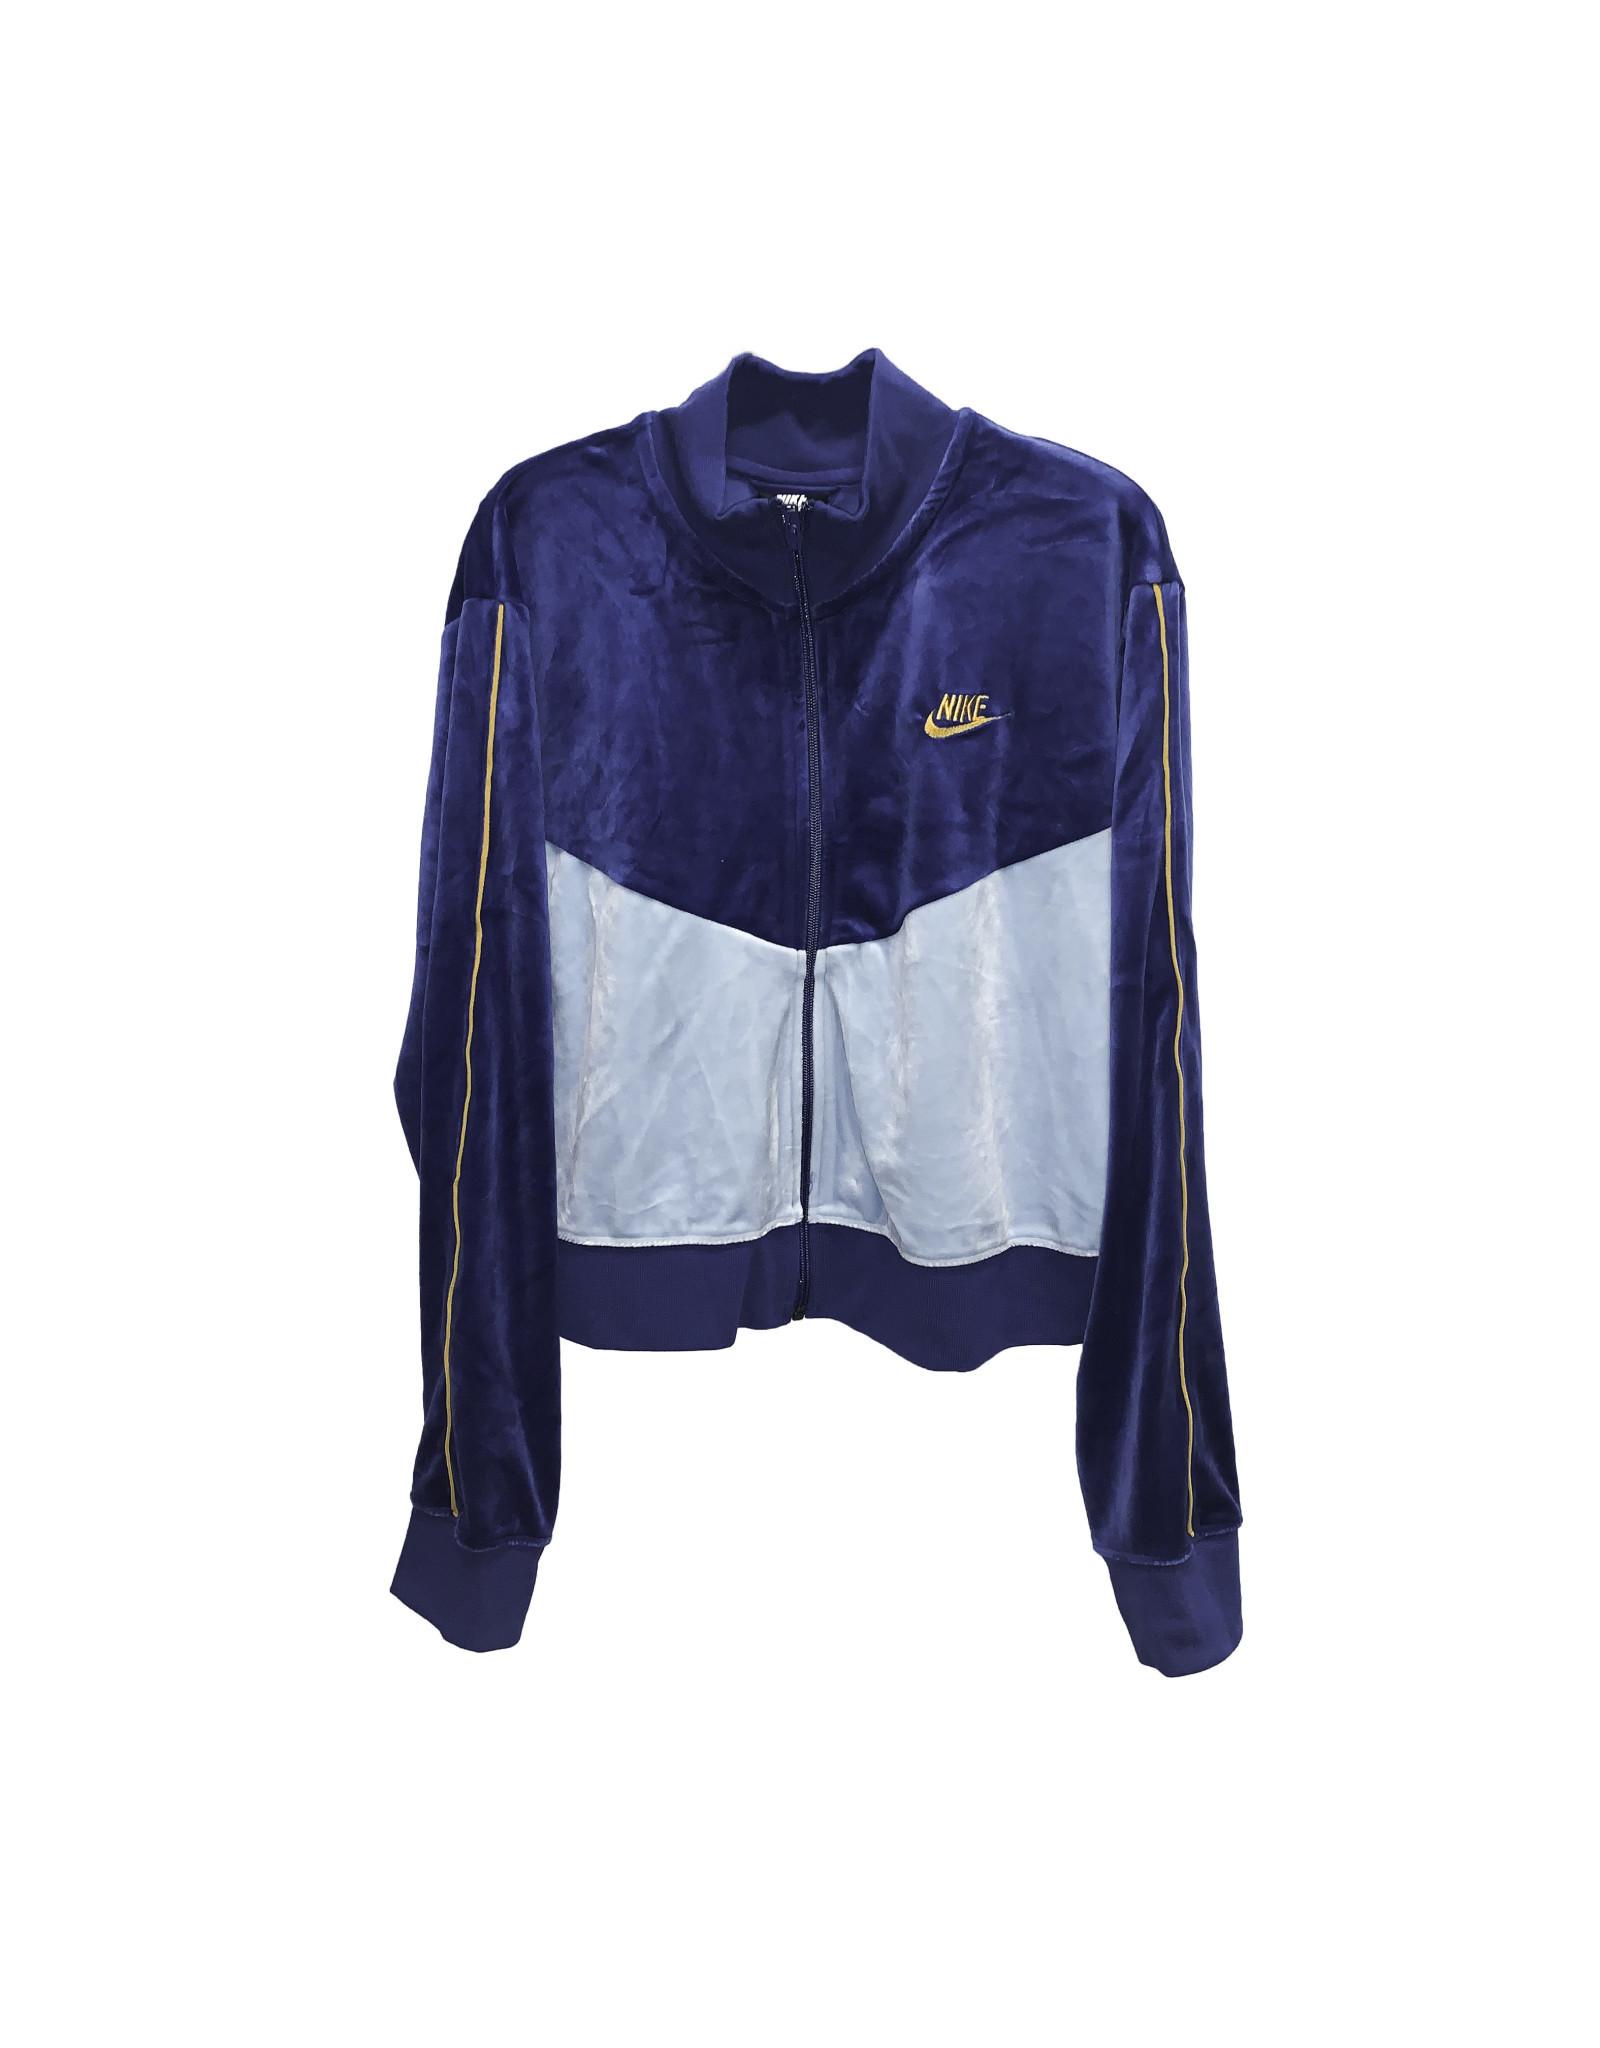 NIKE NIKE Sportswear Velour Colourblocked